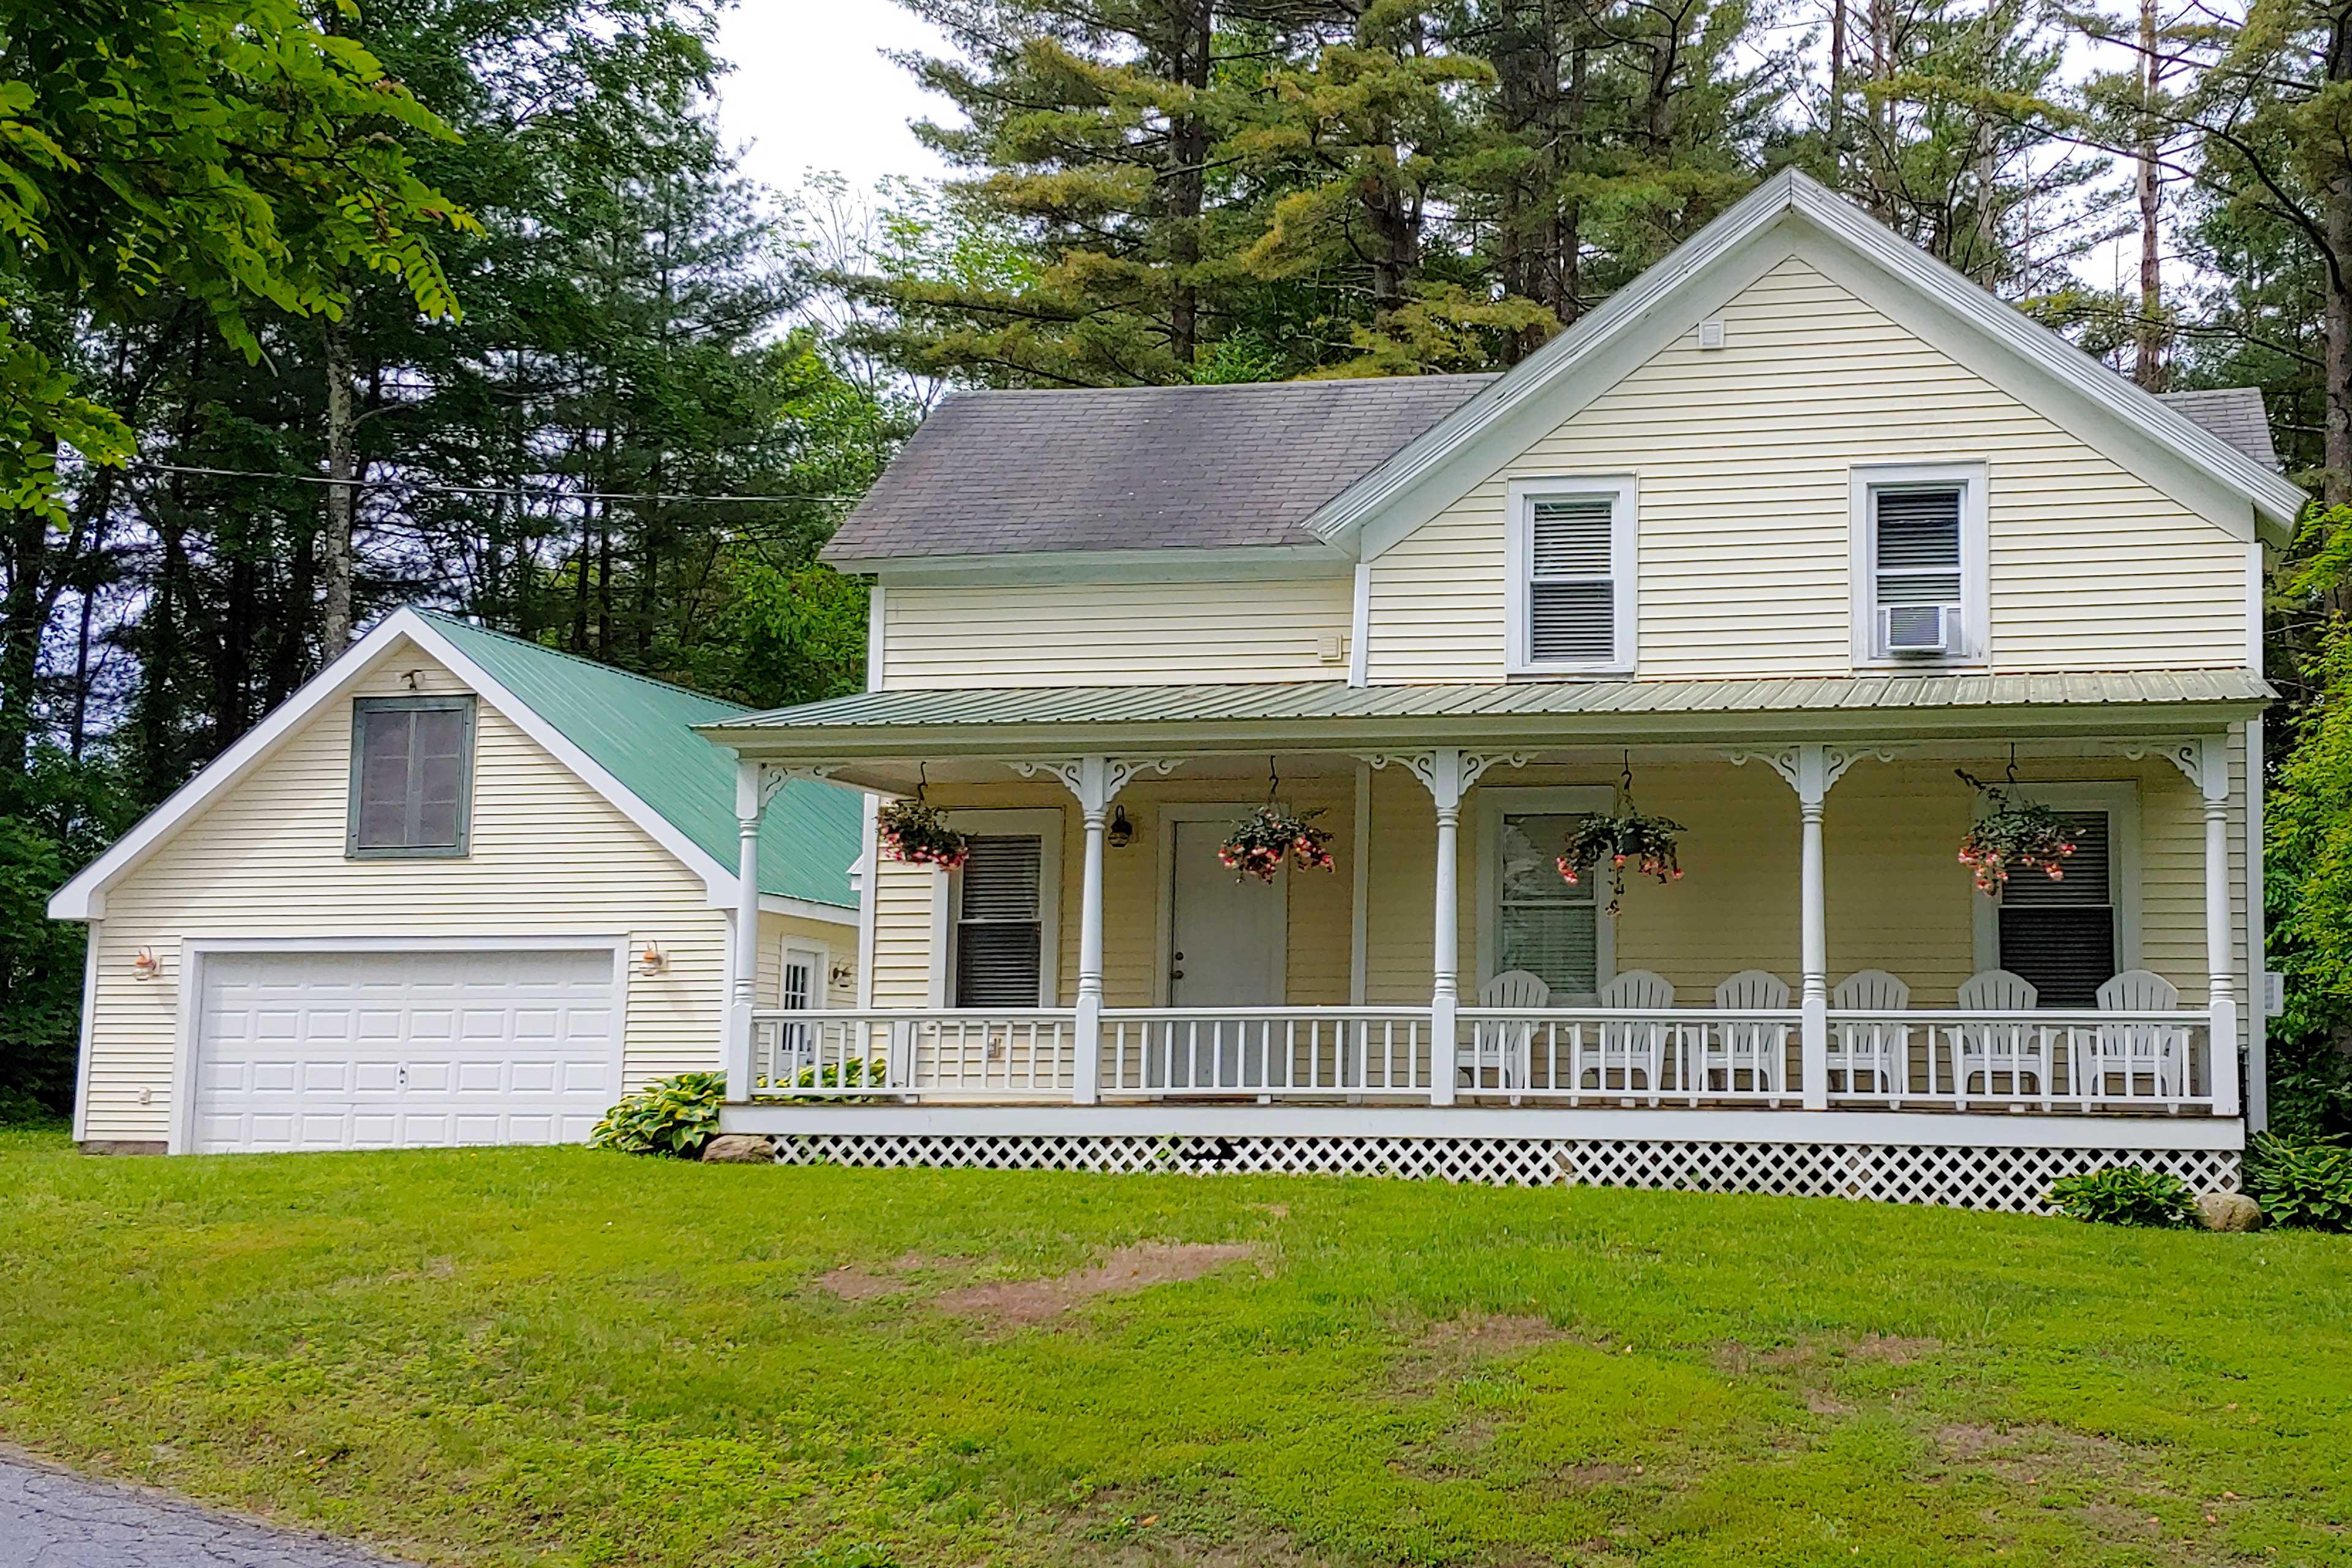 Family-friendly fun awaits at this 4-bedroom, 2-bath Warrensburg home!